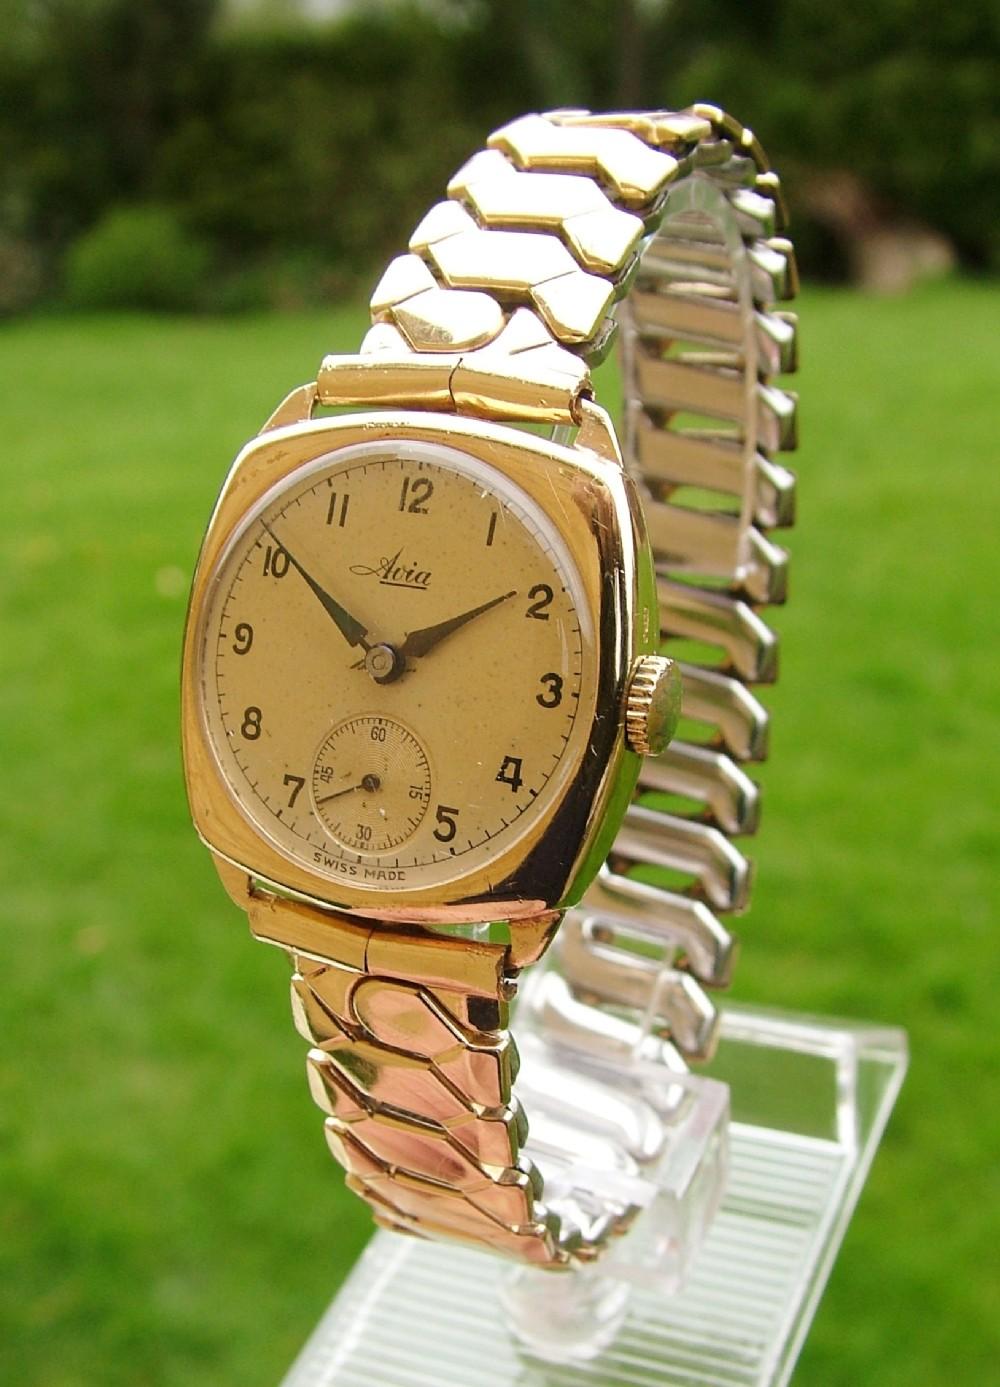 1940s 9 carat gold avia cushion cased wrist watch